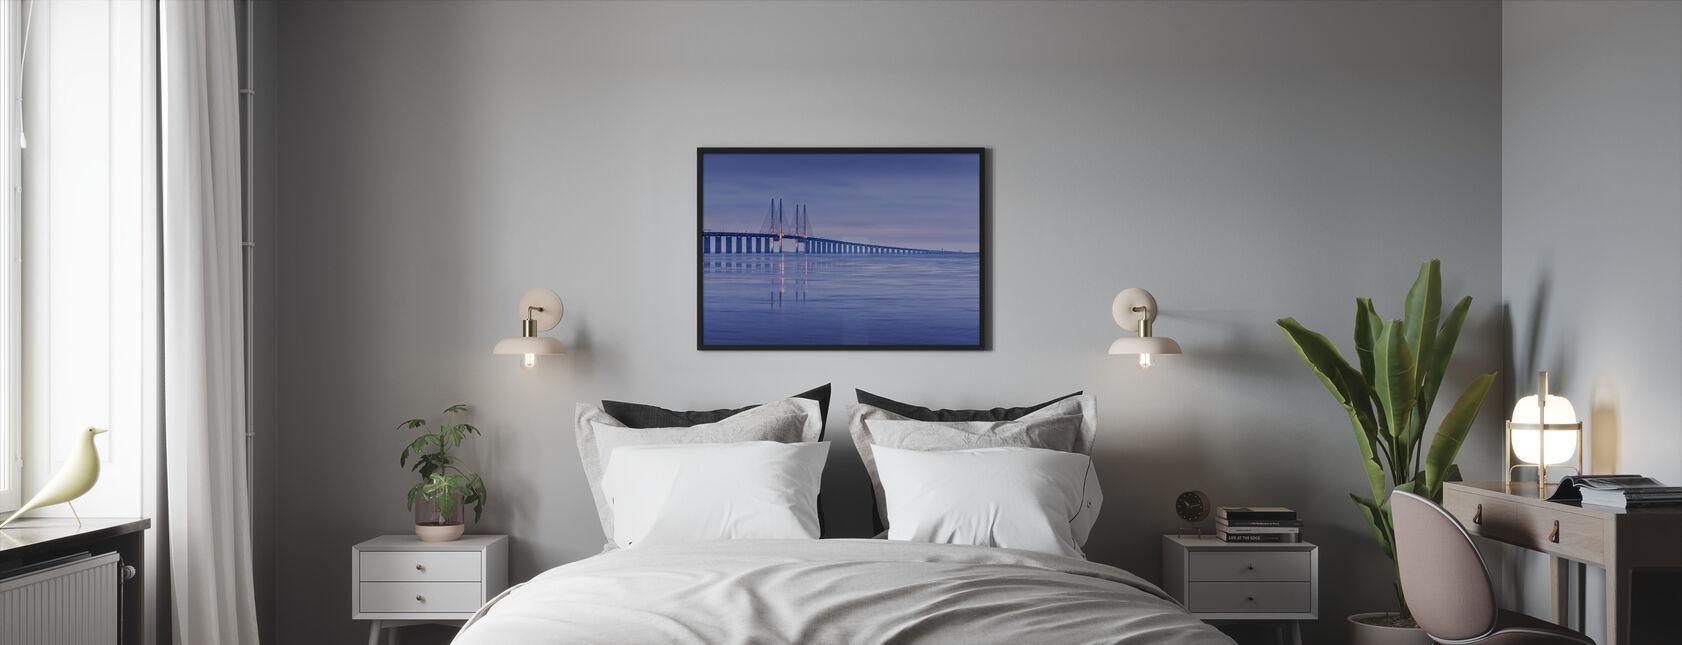 Öresundsbron - Inramad tavla - Sovrum